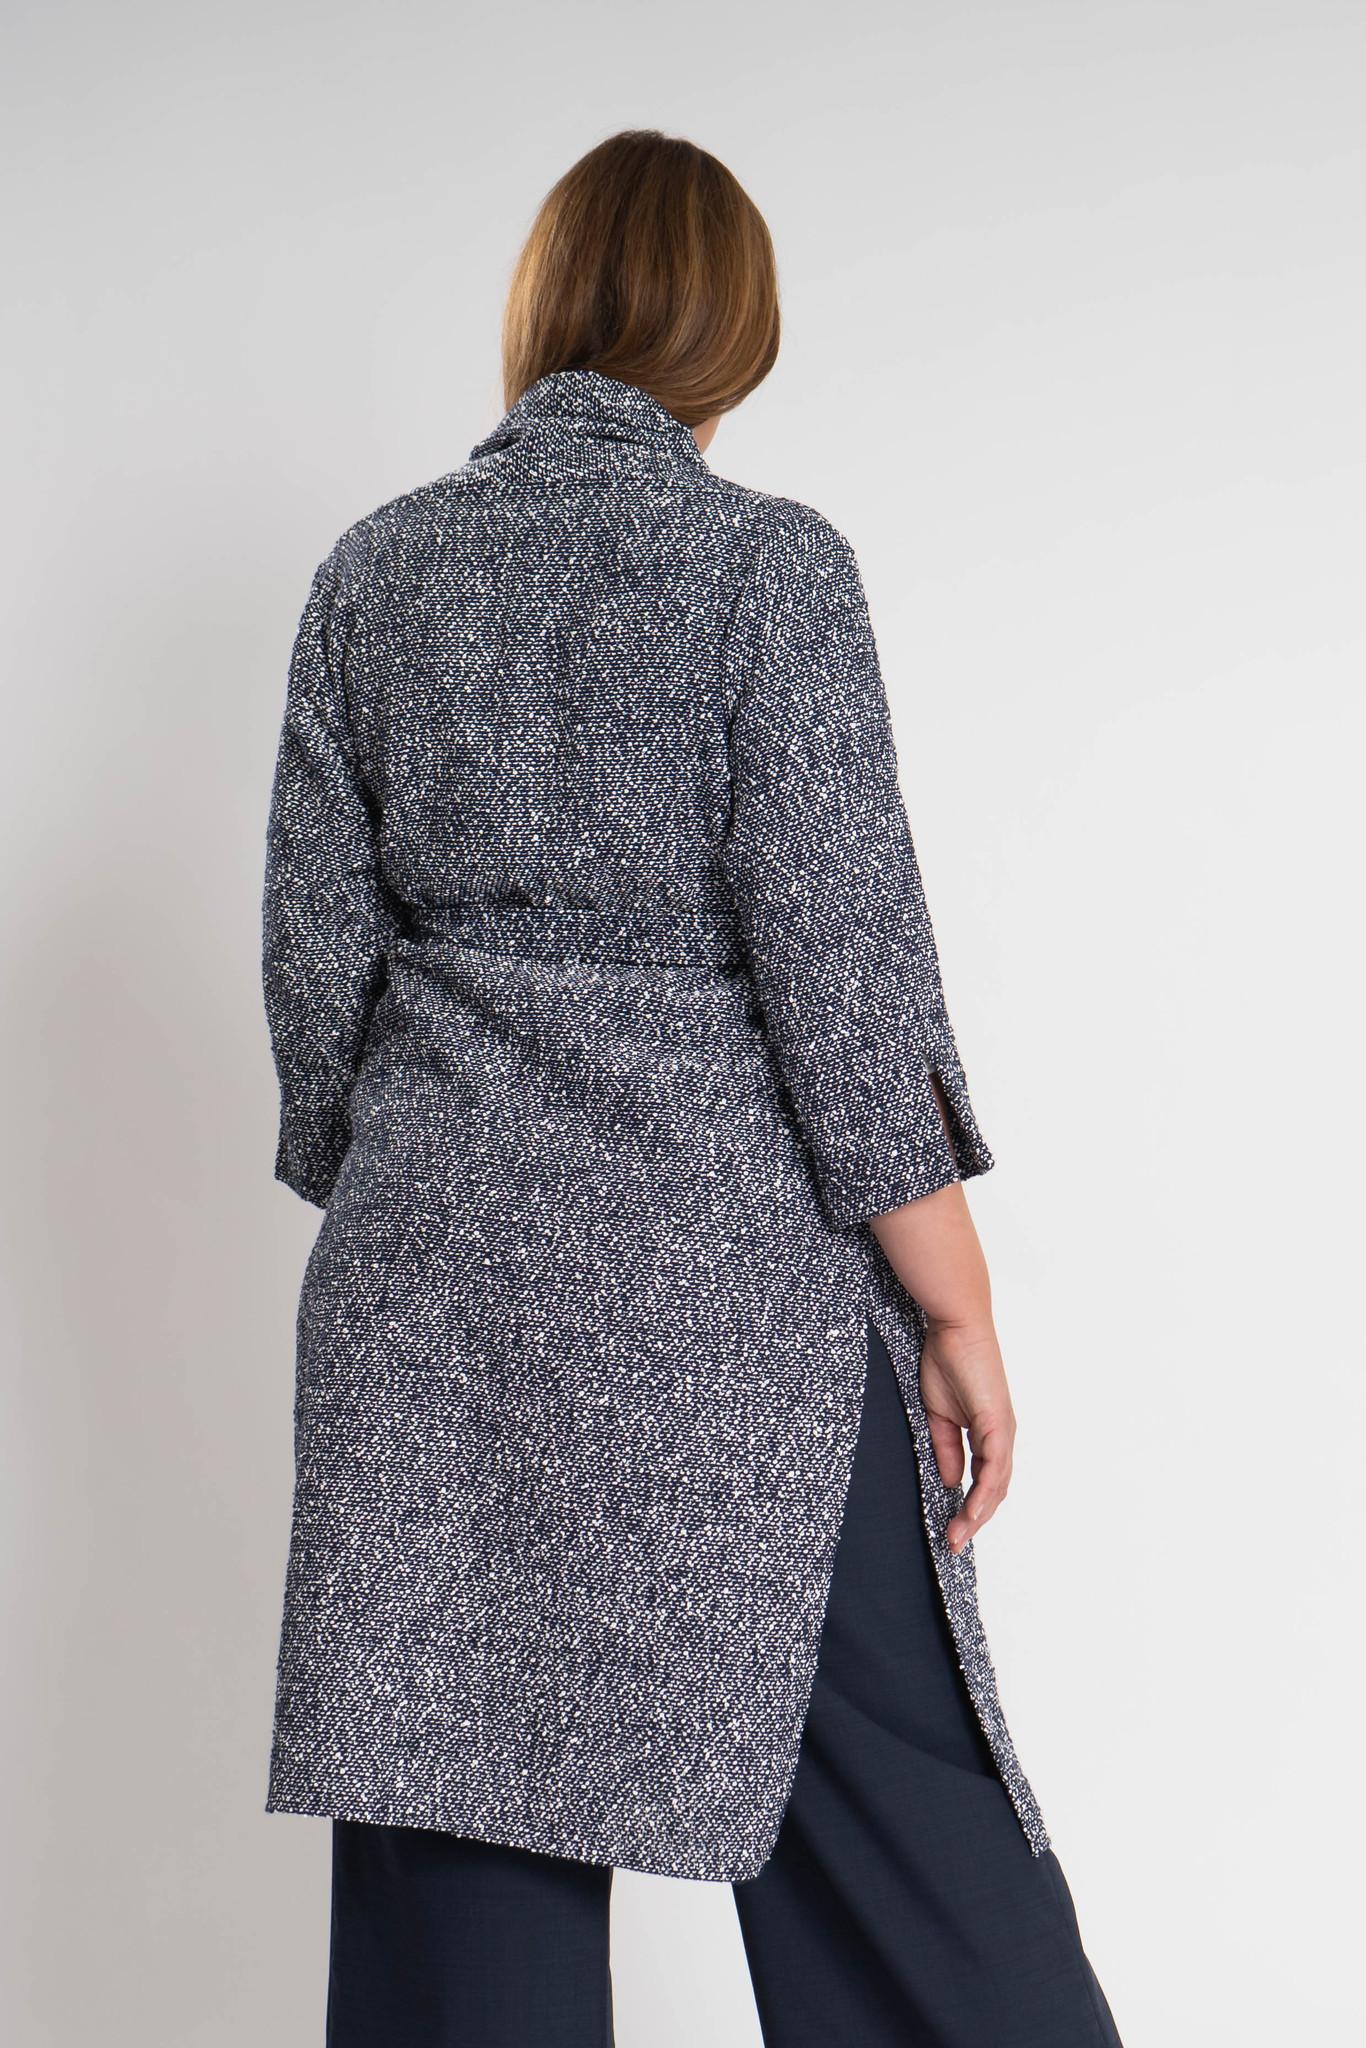 KARINA Jacket in fine Cotton-Bouclé-3